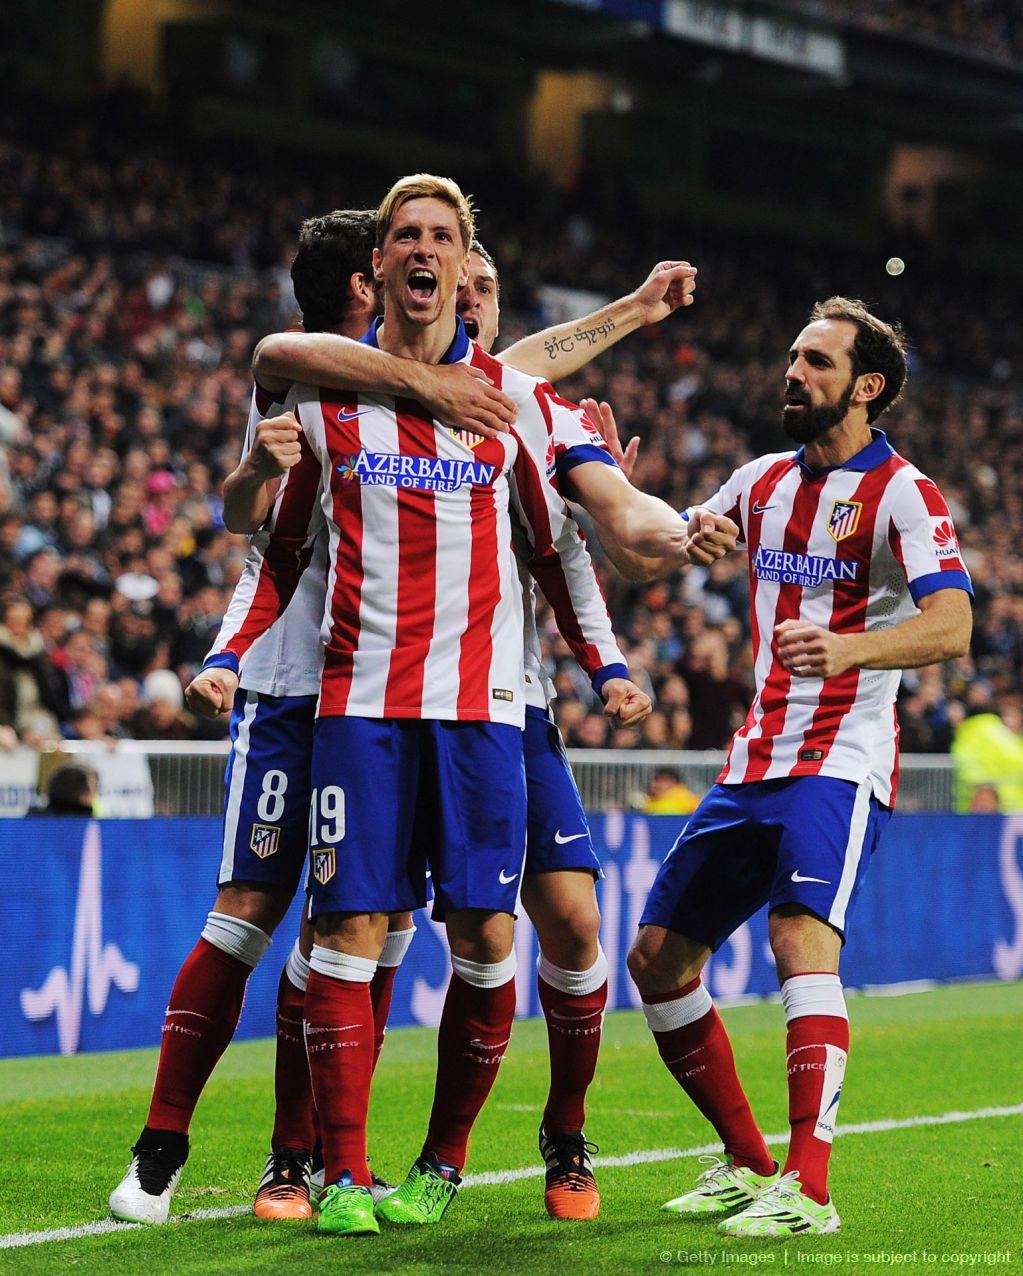 #Fernando Torres #Juanfran #Atletico Madrid #Club Atletico d